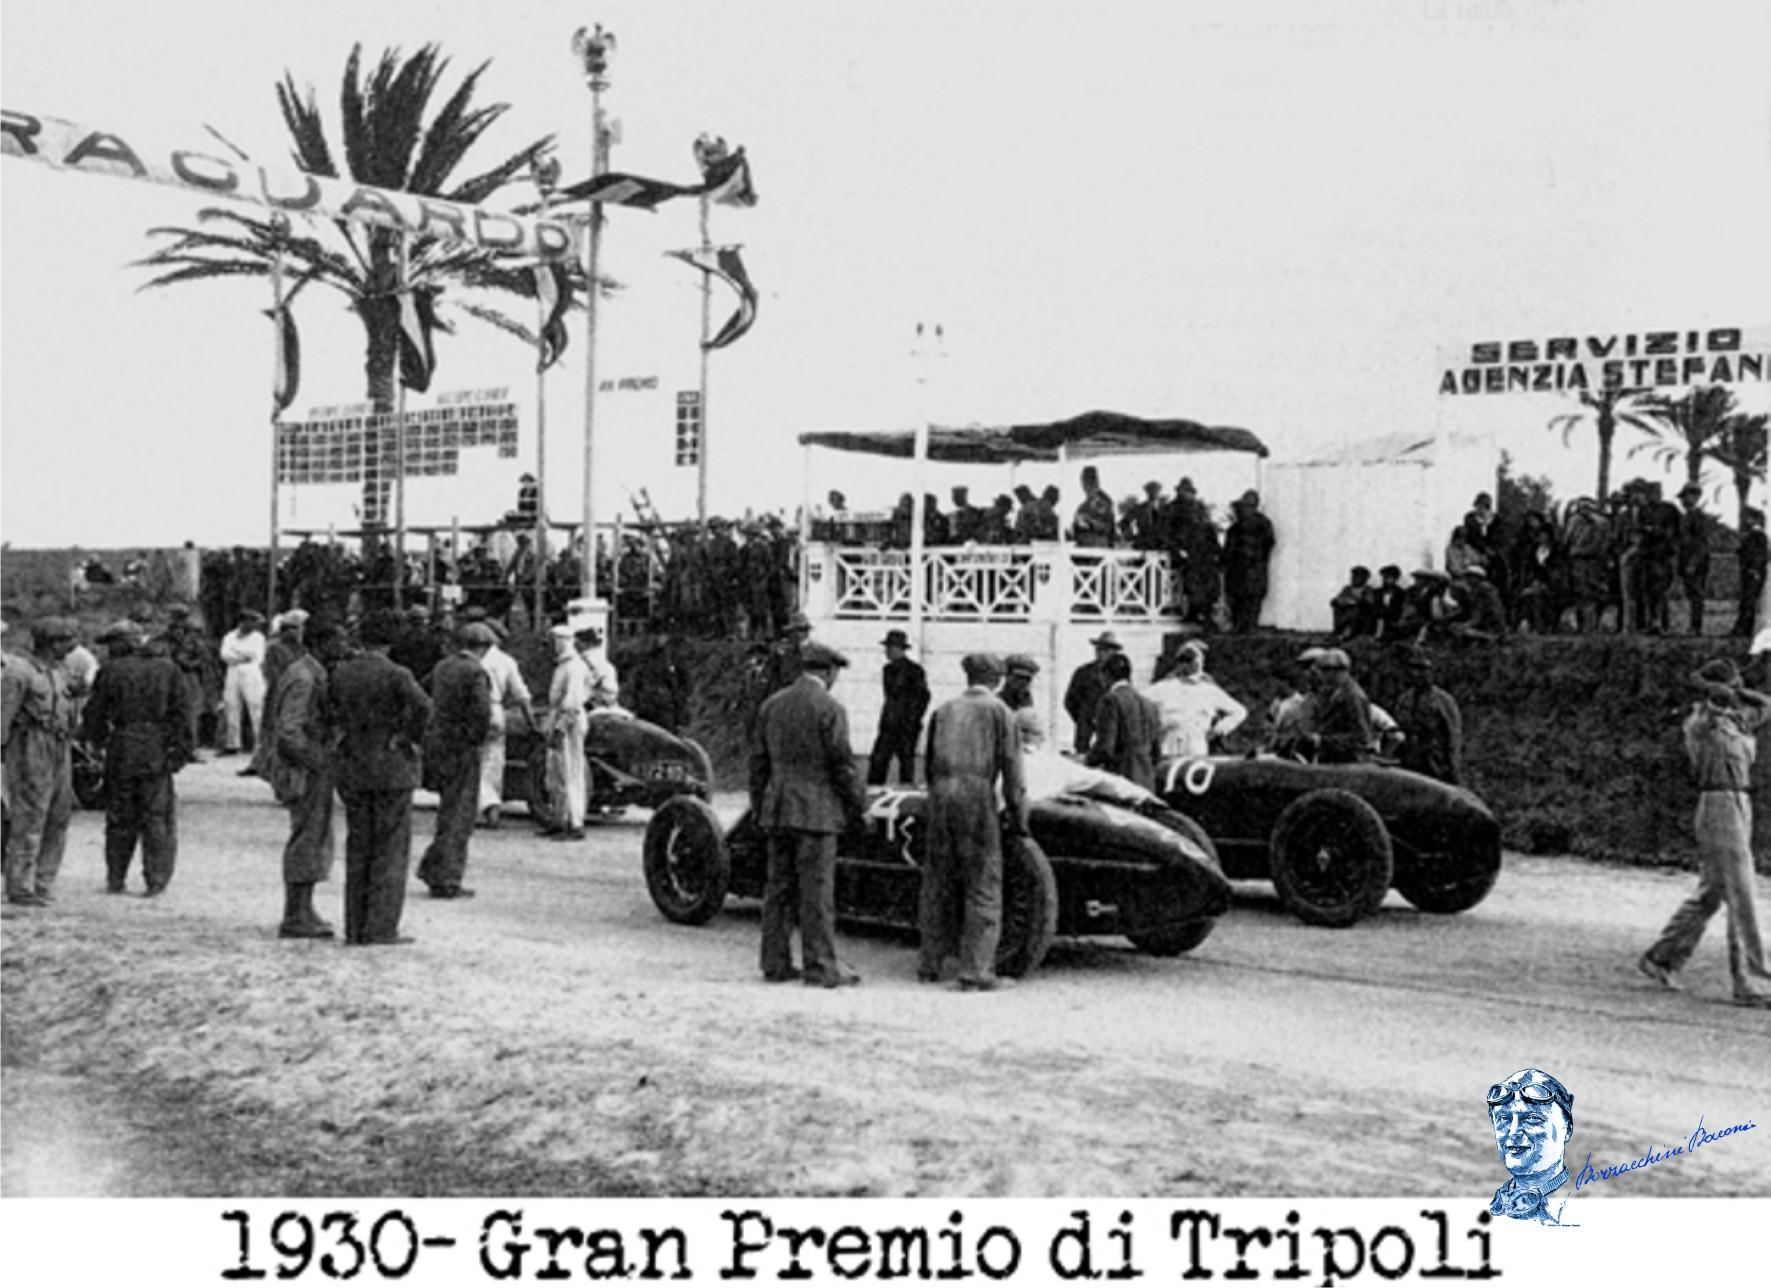 1930 gran premio tripoli 8